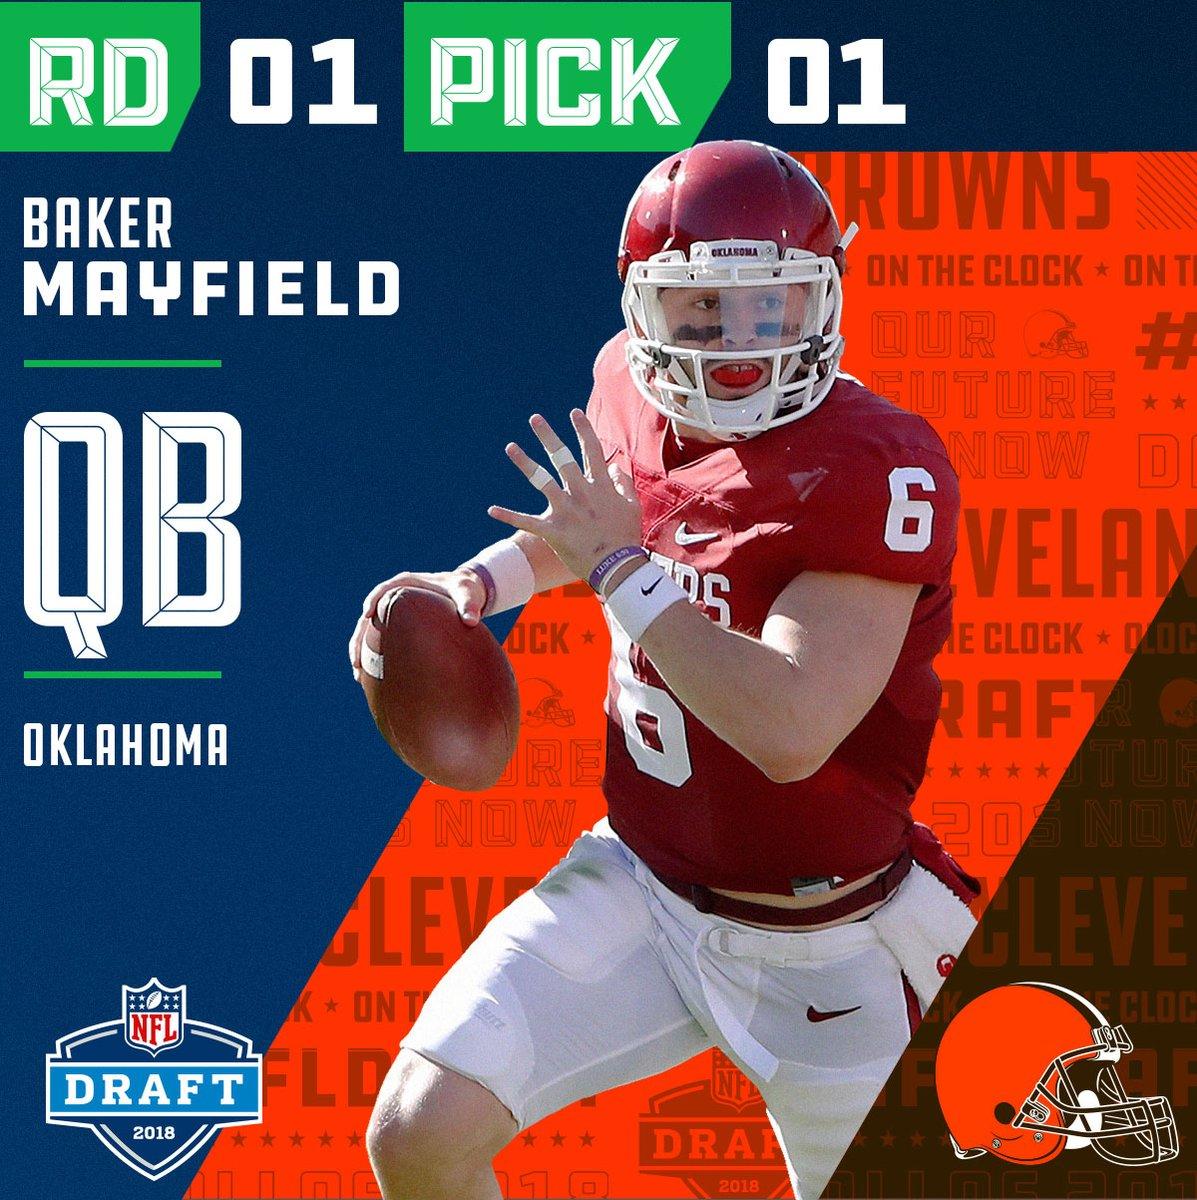 Draft: Browns surpreendem e escolhem polêmico Baker Mayfield como número um https://t.co/hRLi0vb6bj